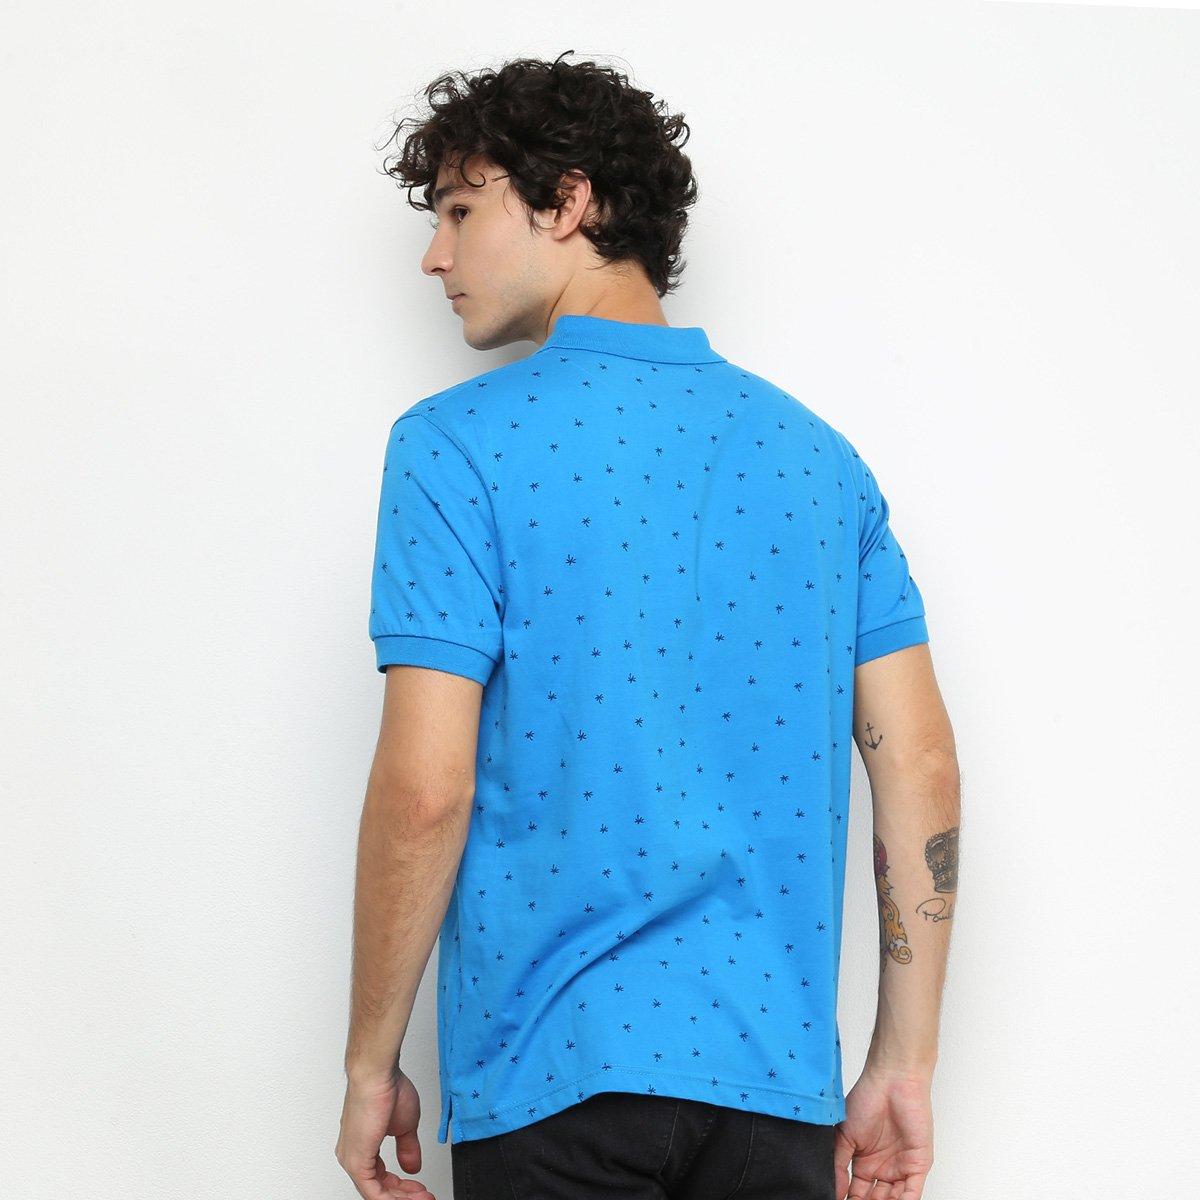 Camisa Polo Lucky Sailing Mini Print Masculina - Azul Royal